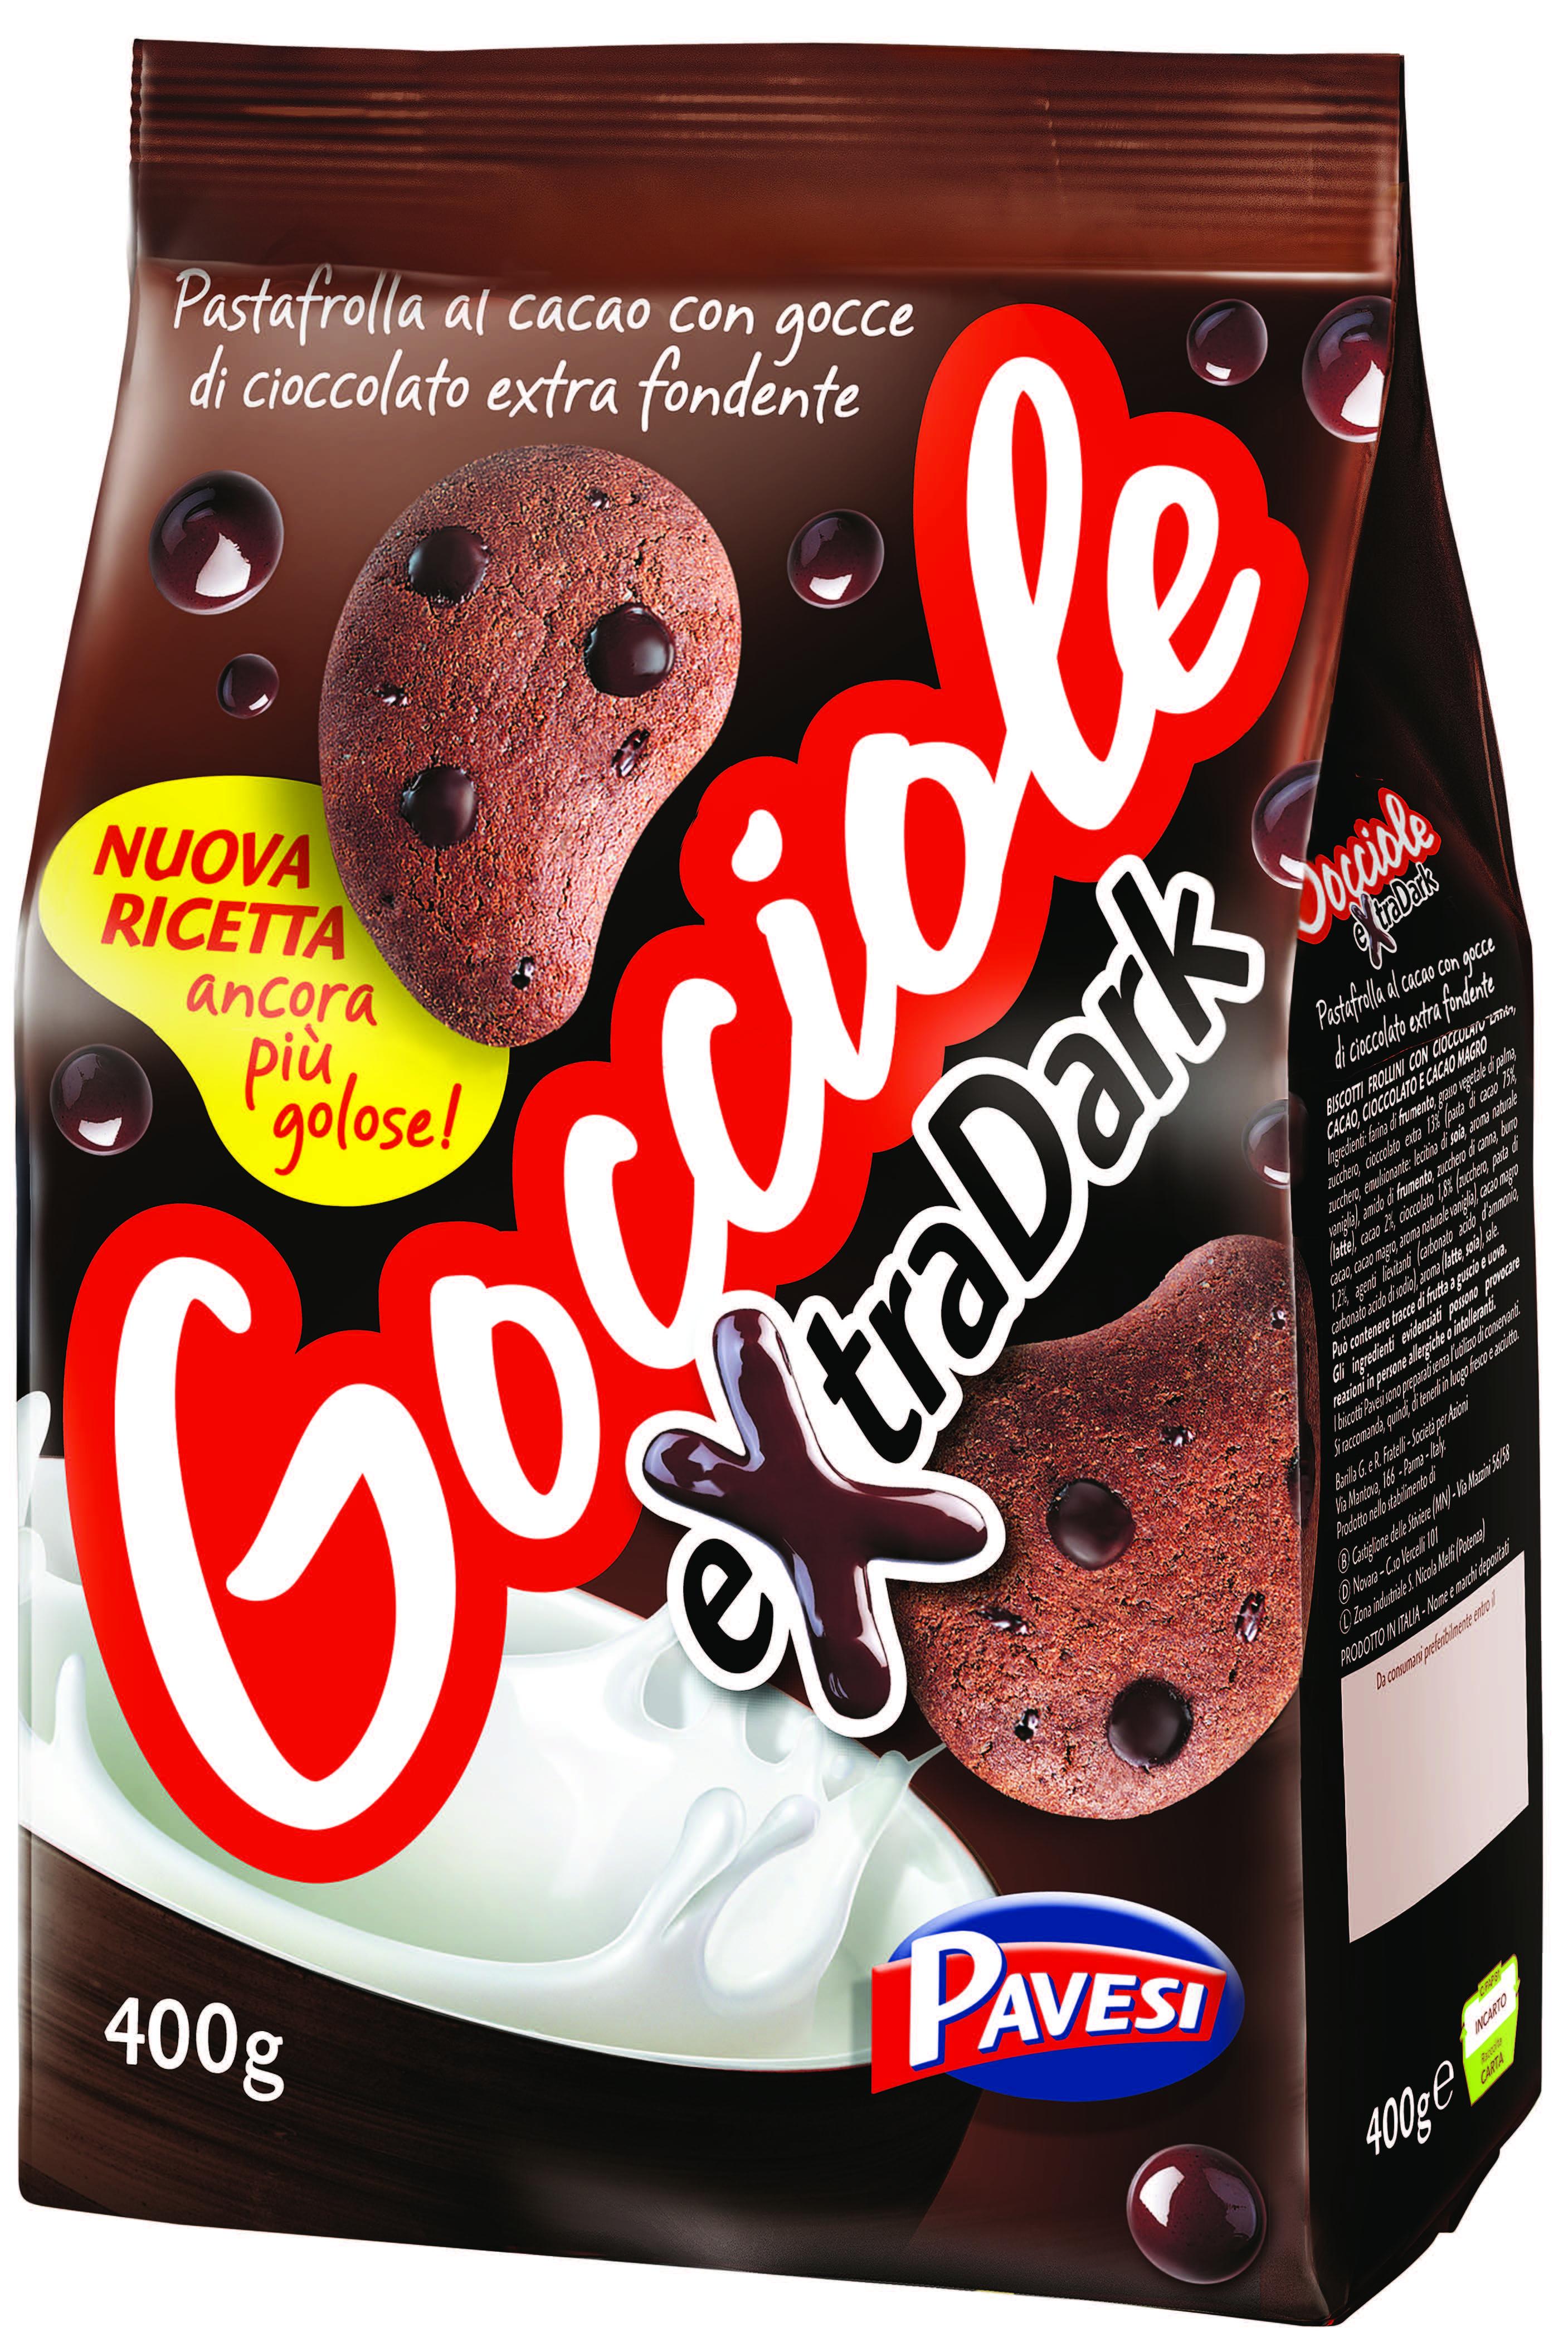 Gocciole extra dark Pavesi